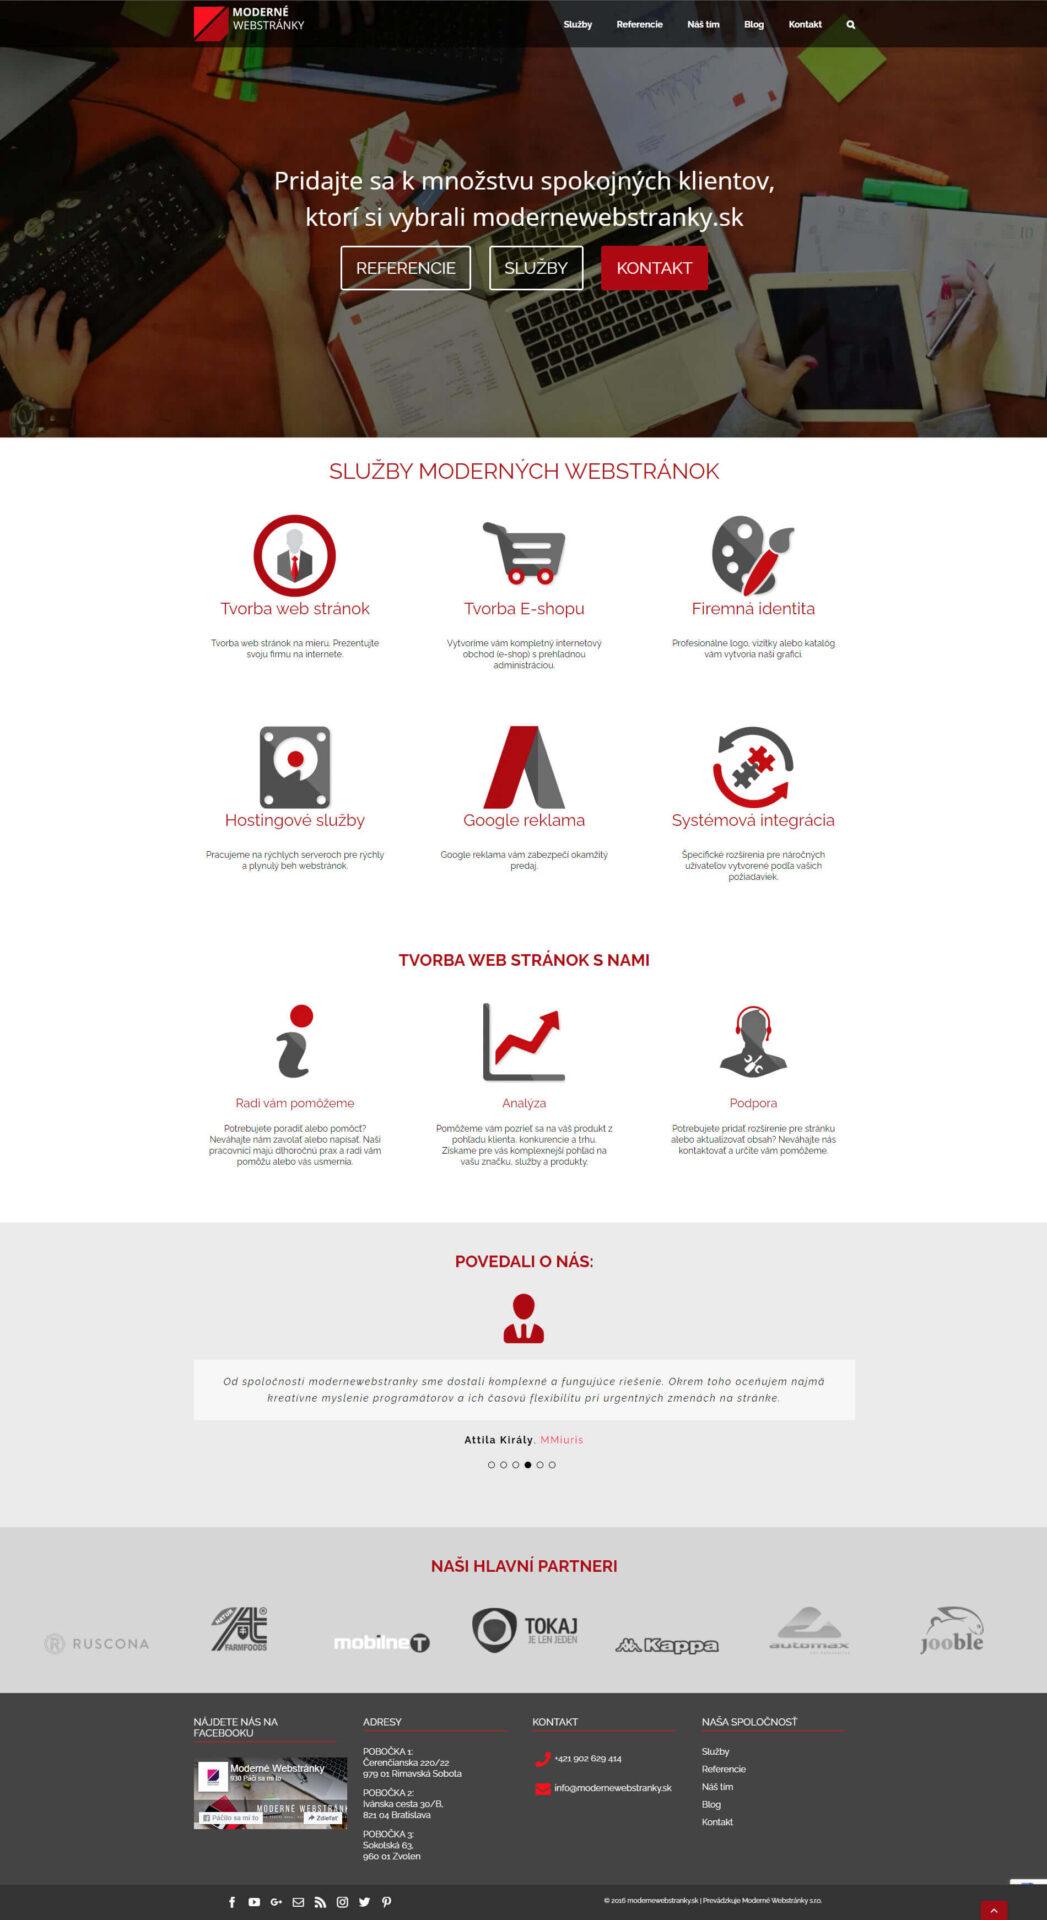 Moderné webstránky verzia 2.0 - domovská stránka